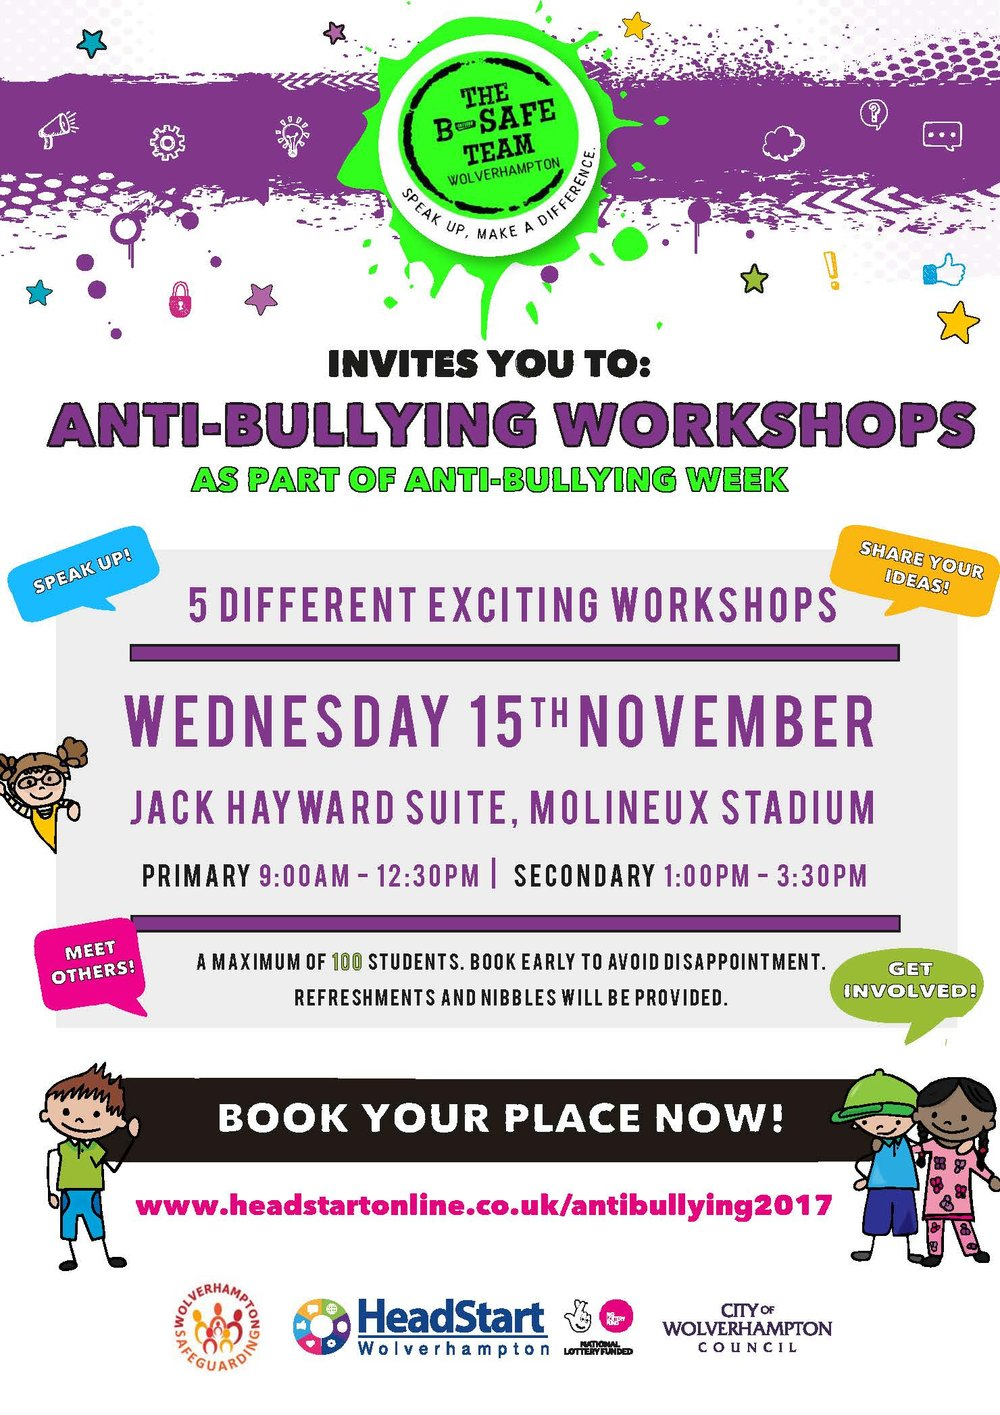 BSafe antibullying week workshop image.jpg